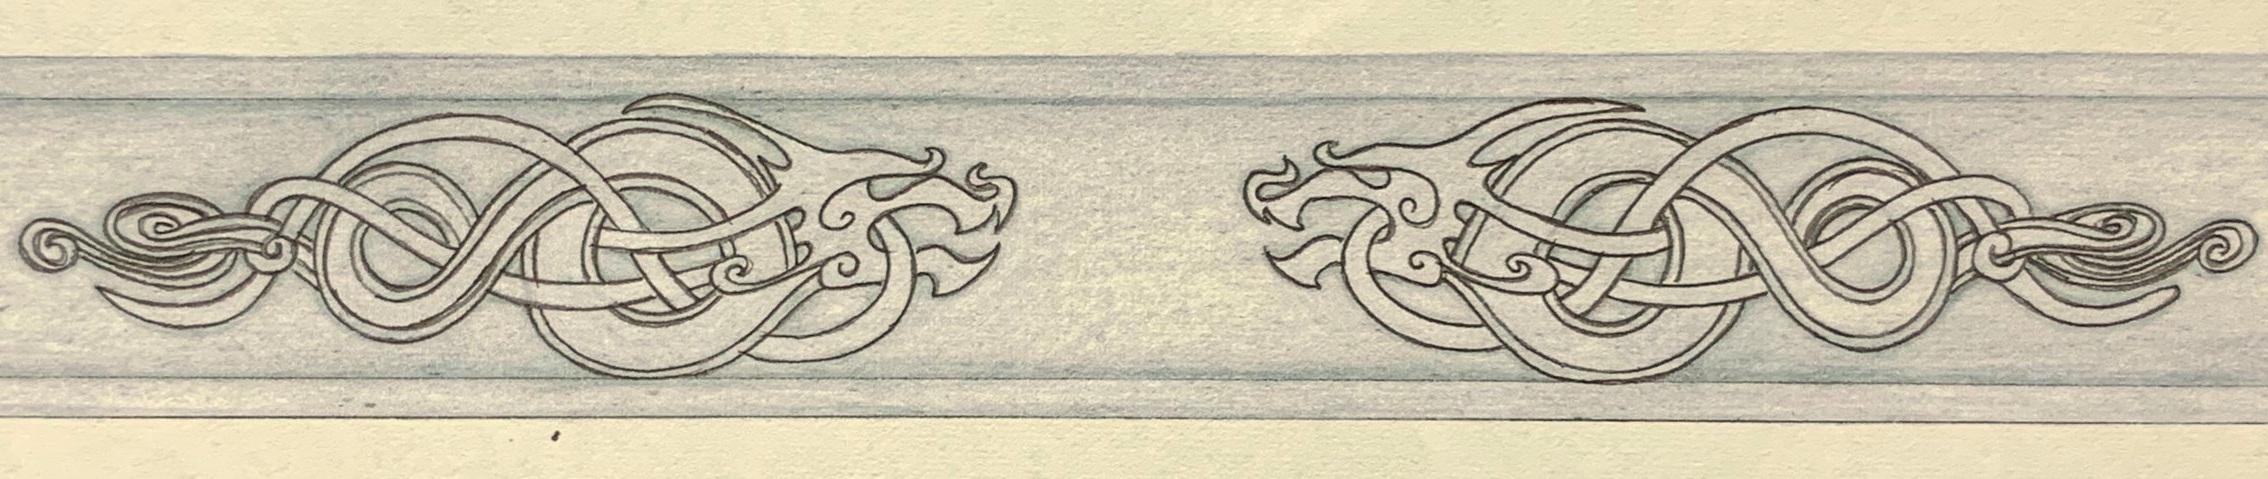 Celtic influenced ring design, laid flat.